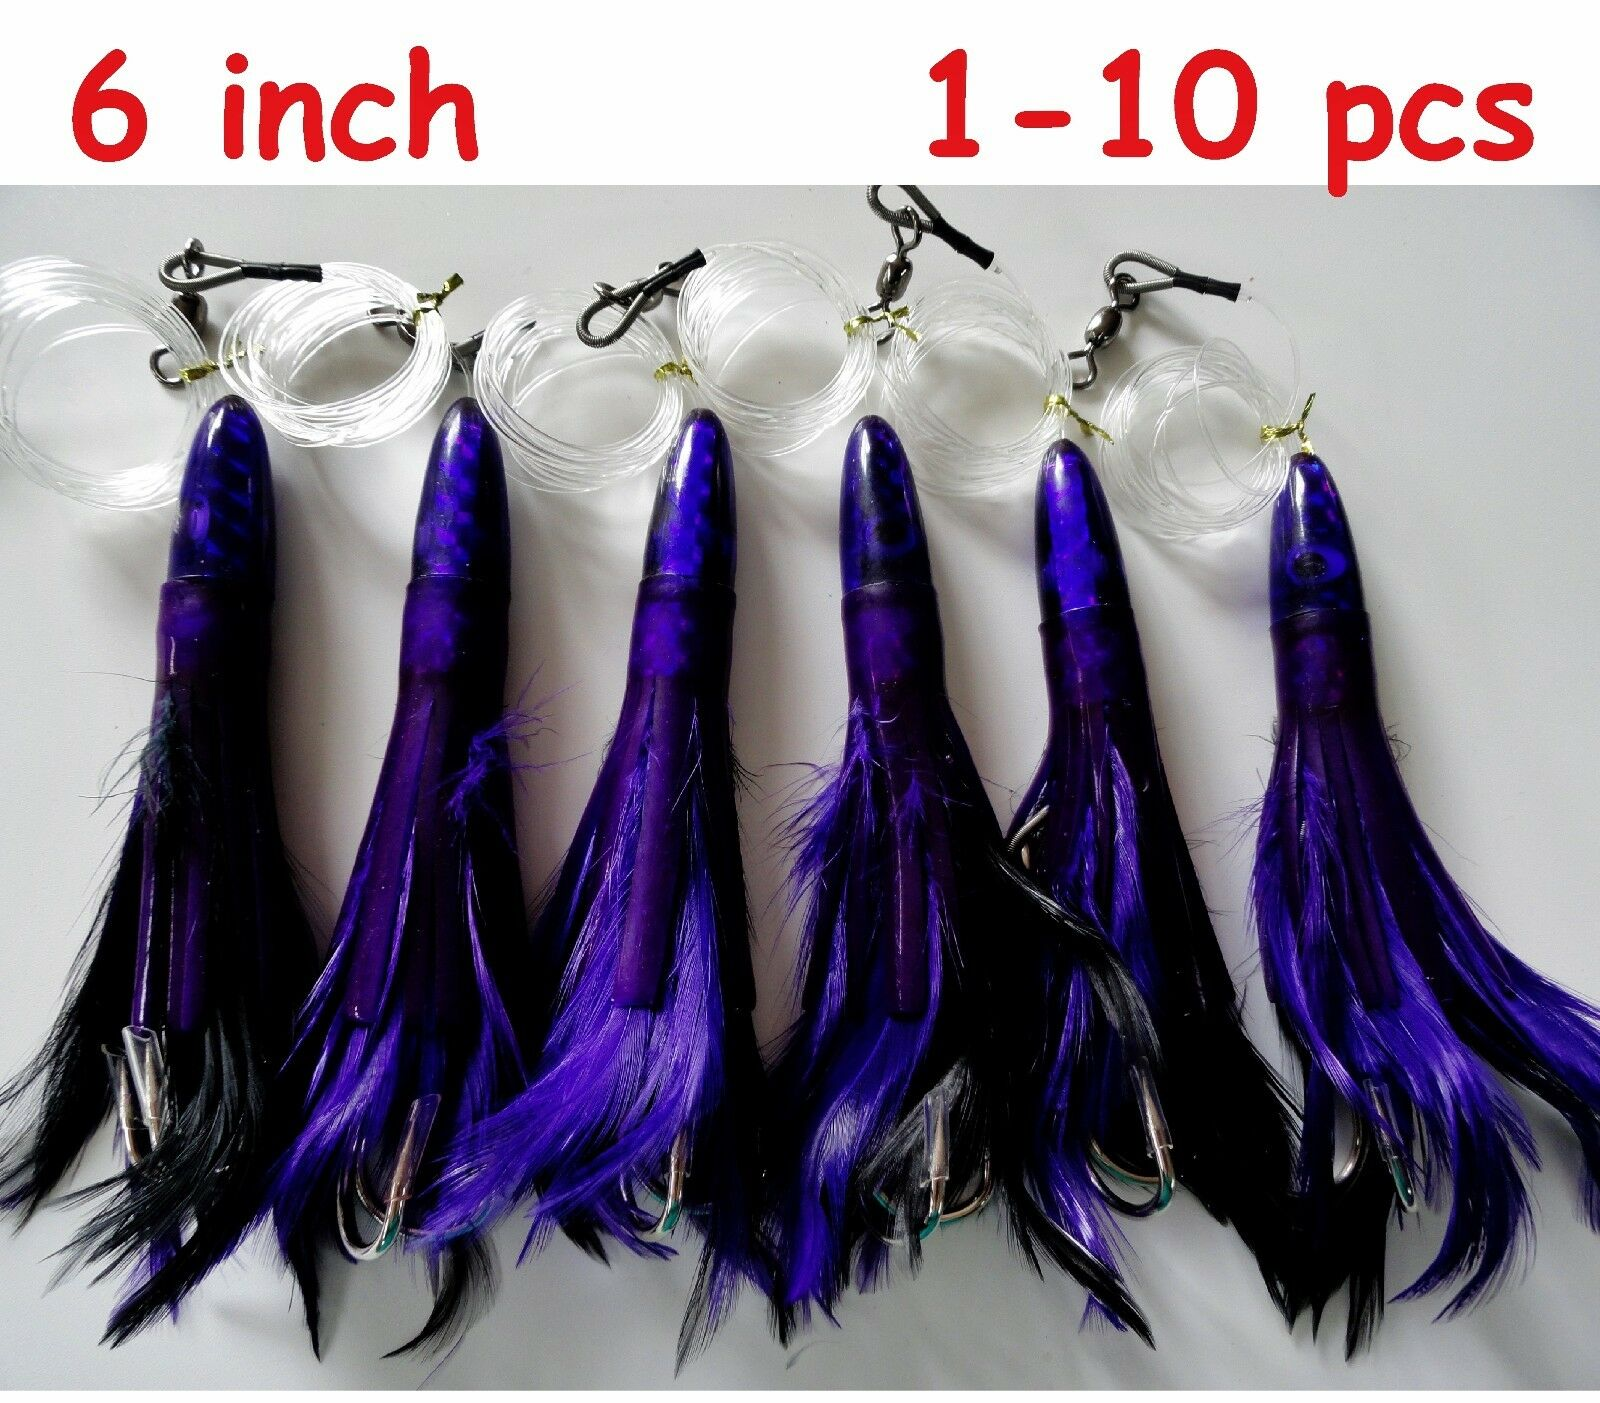 1-10 pcs 6  Rigged Tuna Feathers Trolling Fishing Lures - Purple